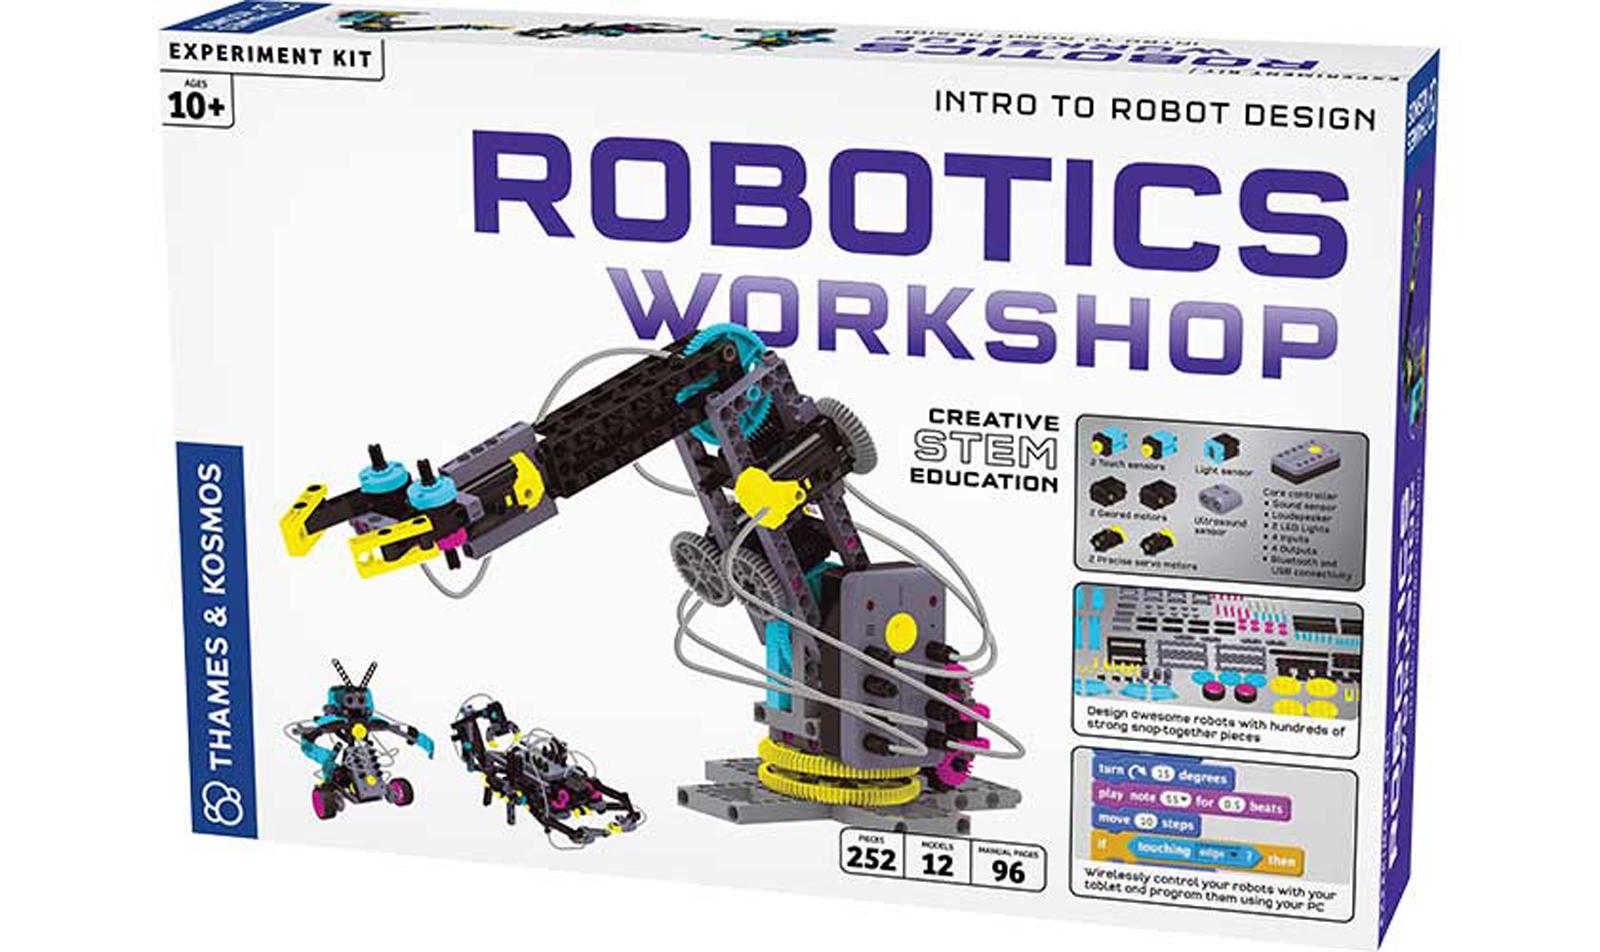 Thames Amp Kosmos Robotics Workshop Intro To Robot Design